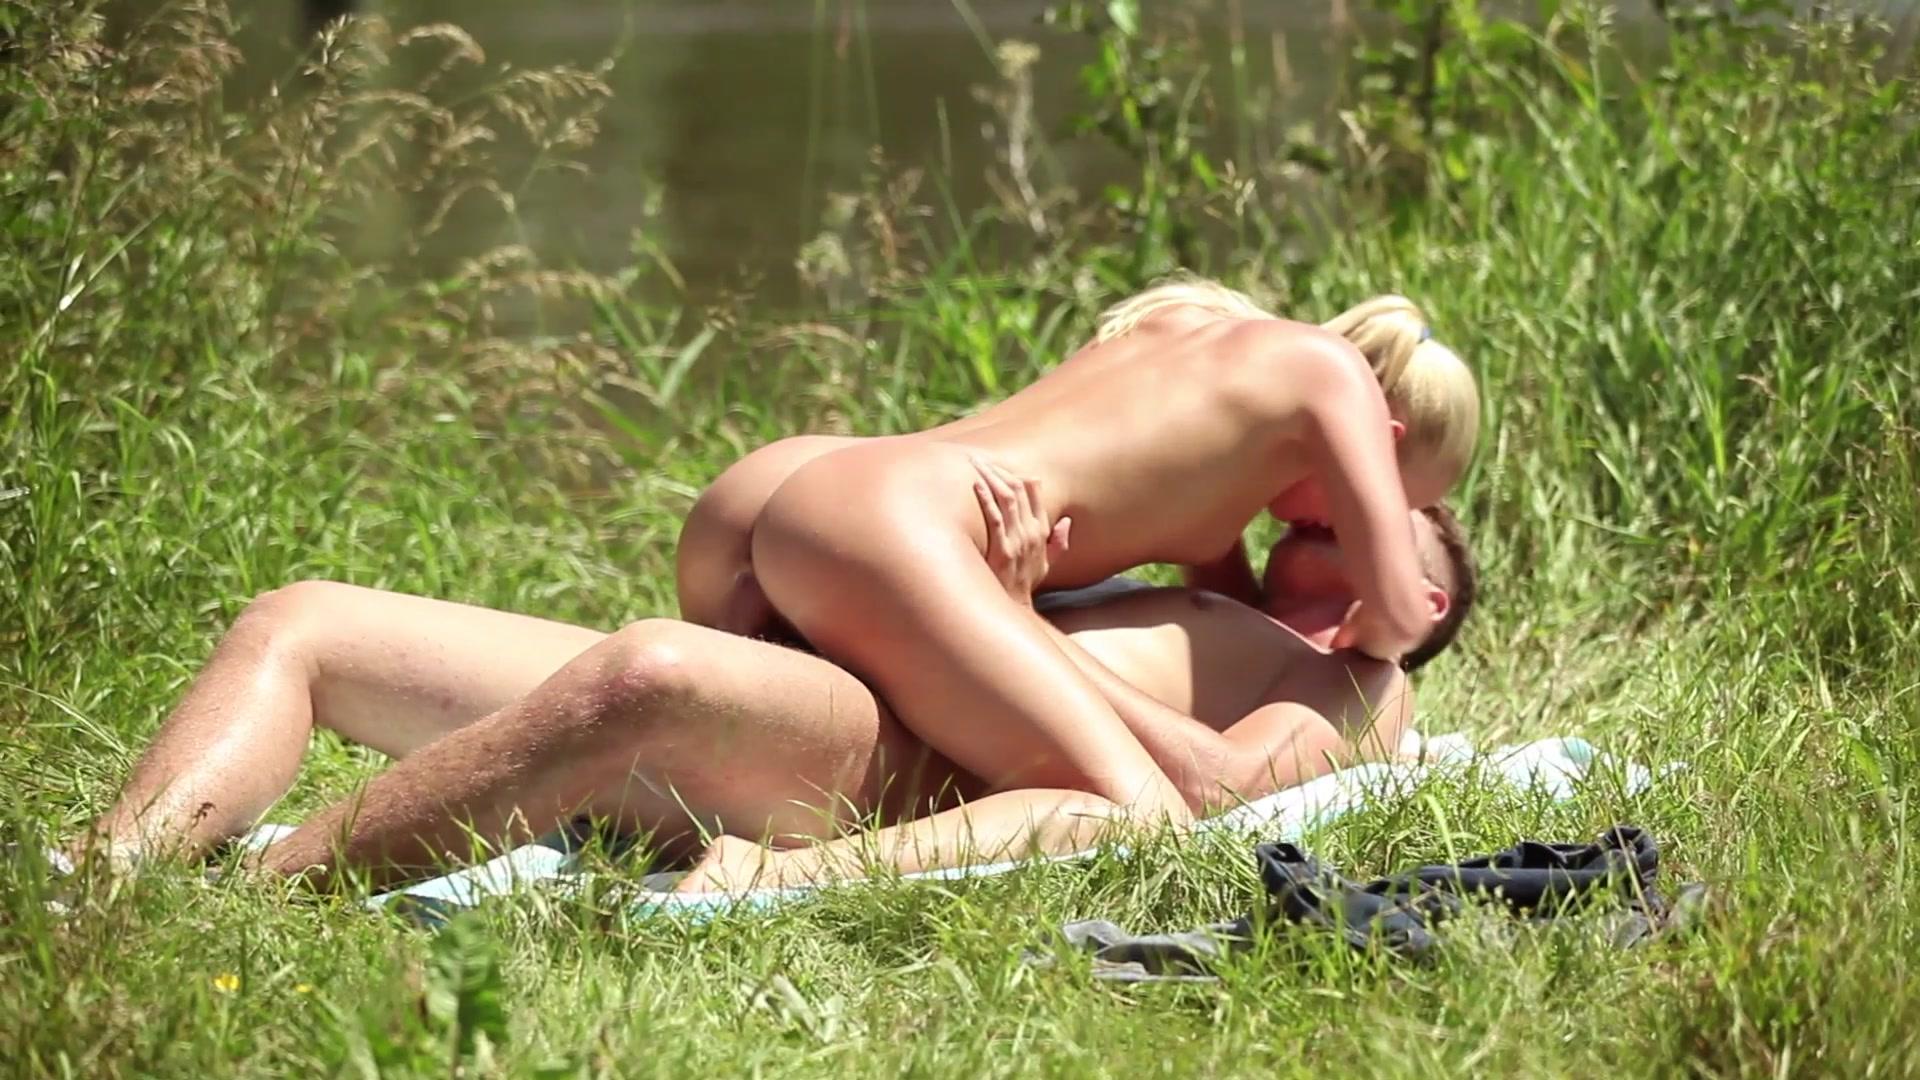 Hot Voyeur Nude Beach Shots